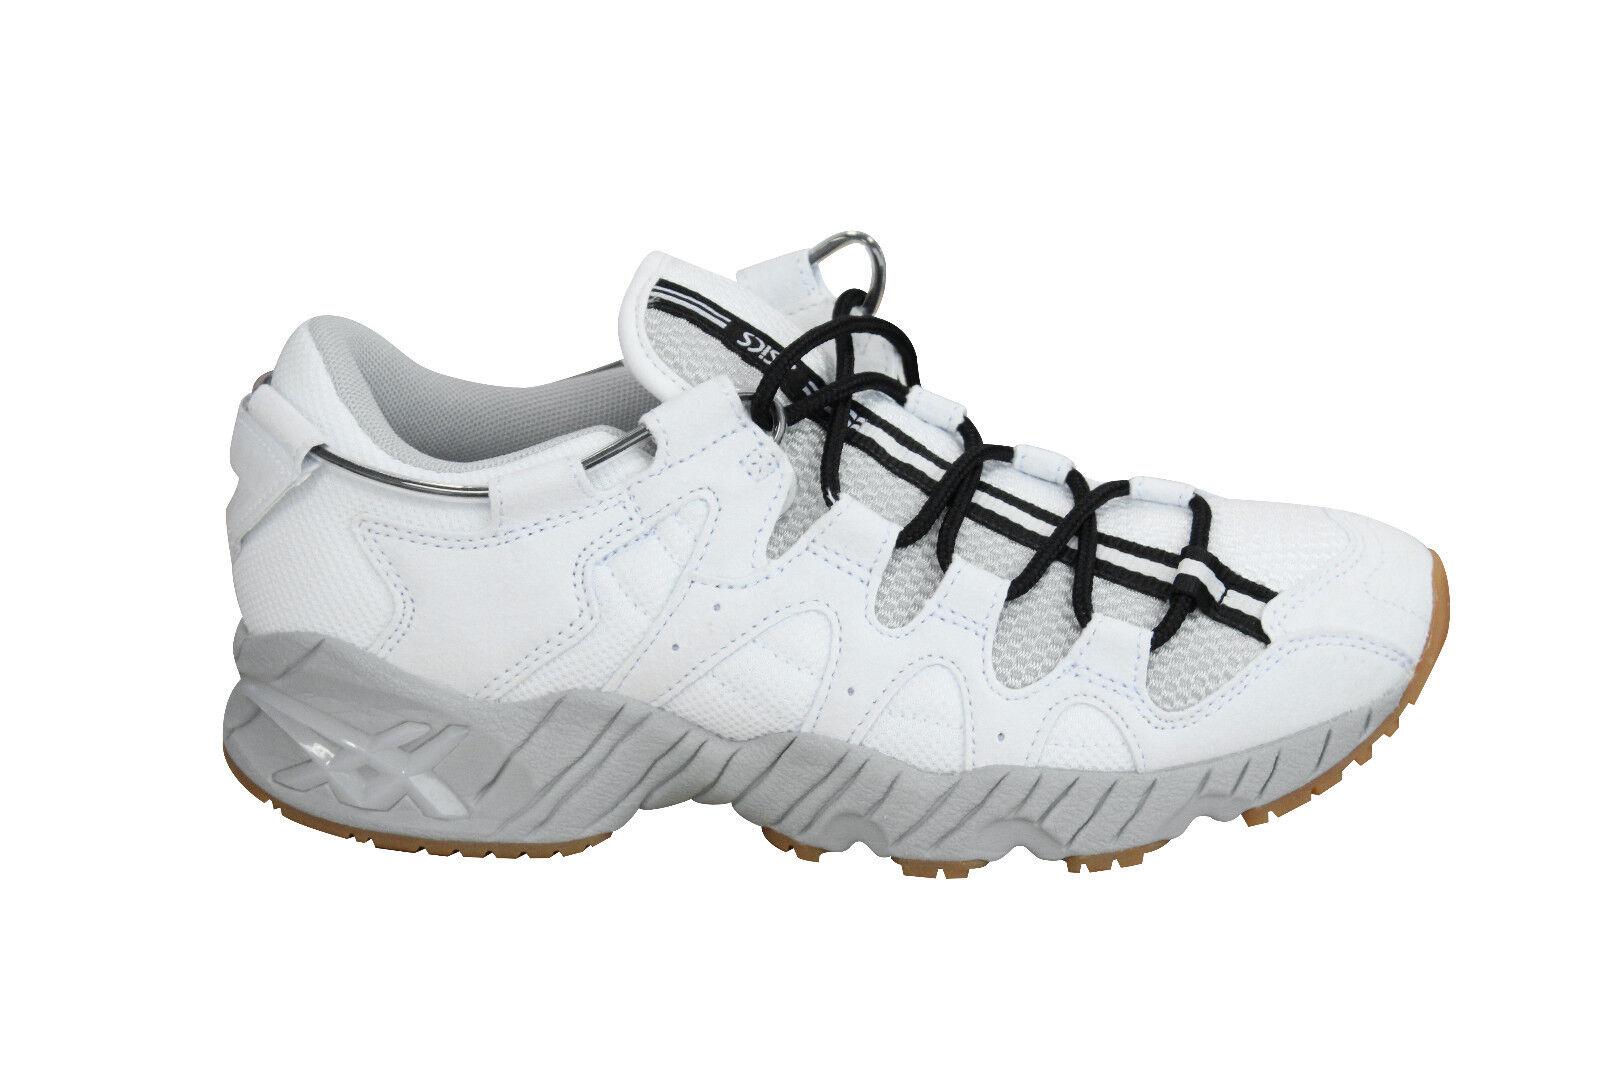 Asics Unisex Gel-Mai Fuzegel Zapatillas para Hombre y Mujer Unisex Asics Blancas HN719 0101 21202d